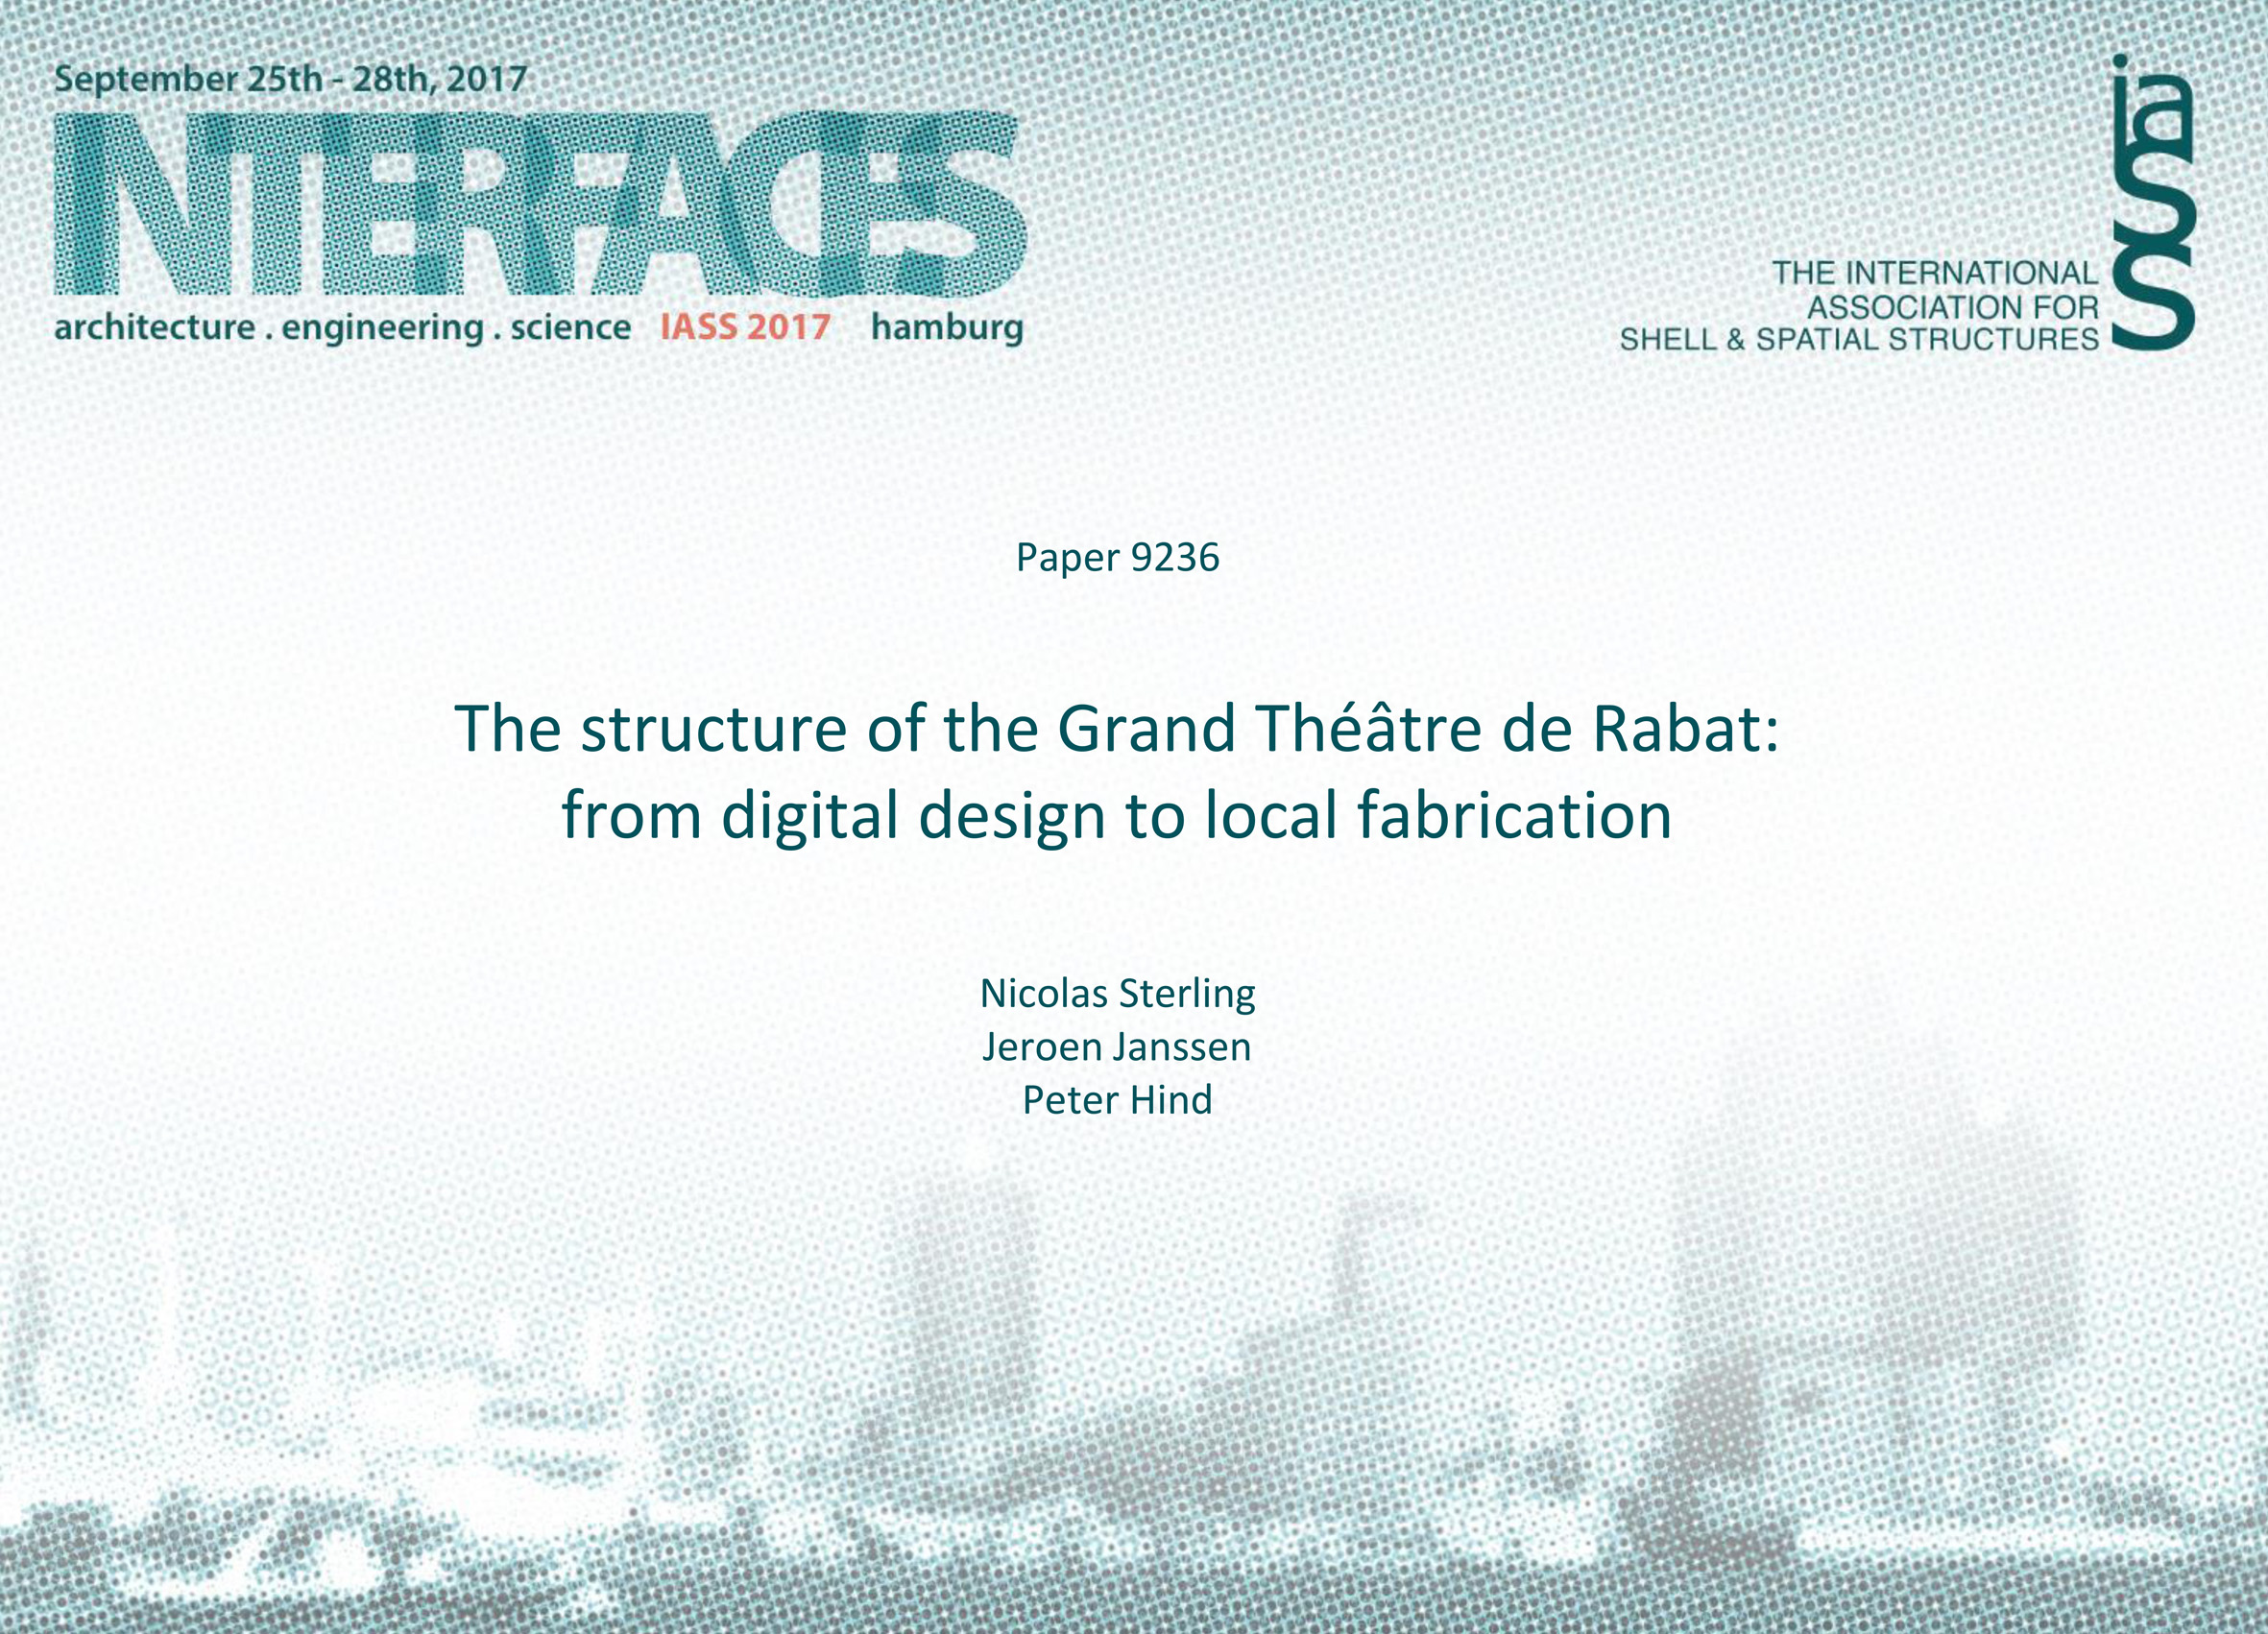 IASS2017 - Grand Theatre Rabat - AKTII - Interfaces - Nicolas Sterling - Jeroen Janssen - Peter Hind - paper9236.jpg